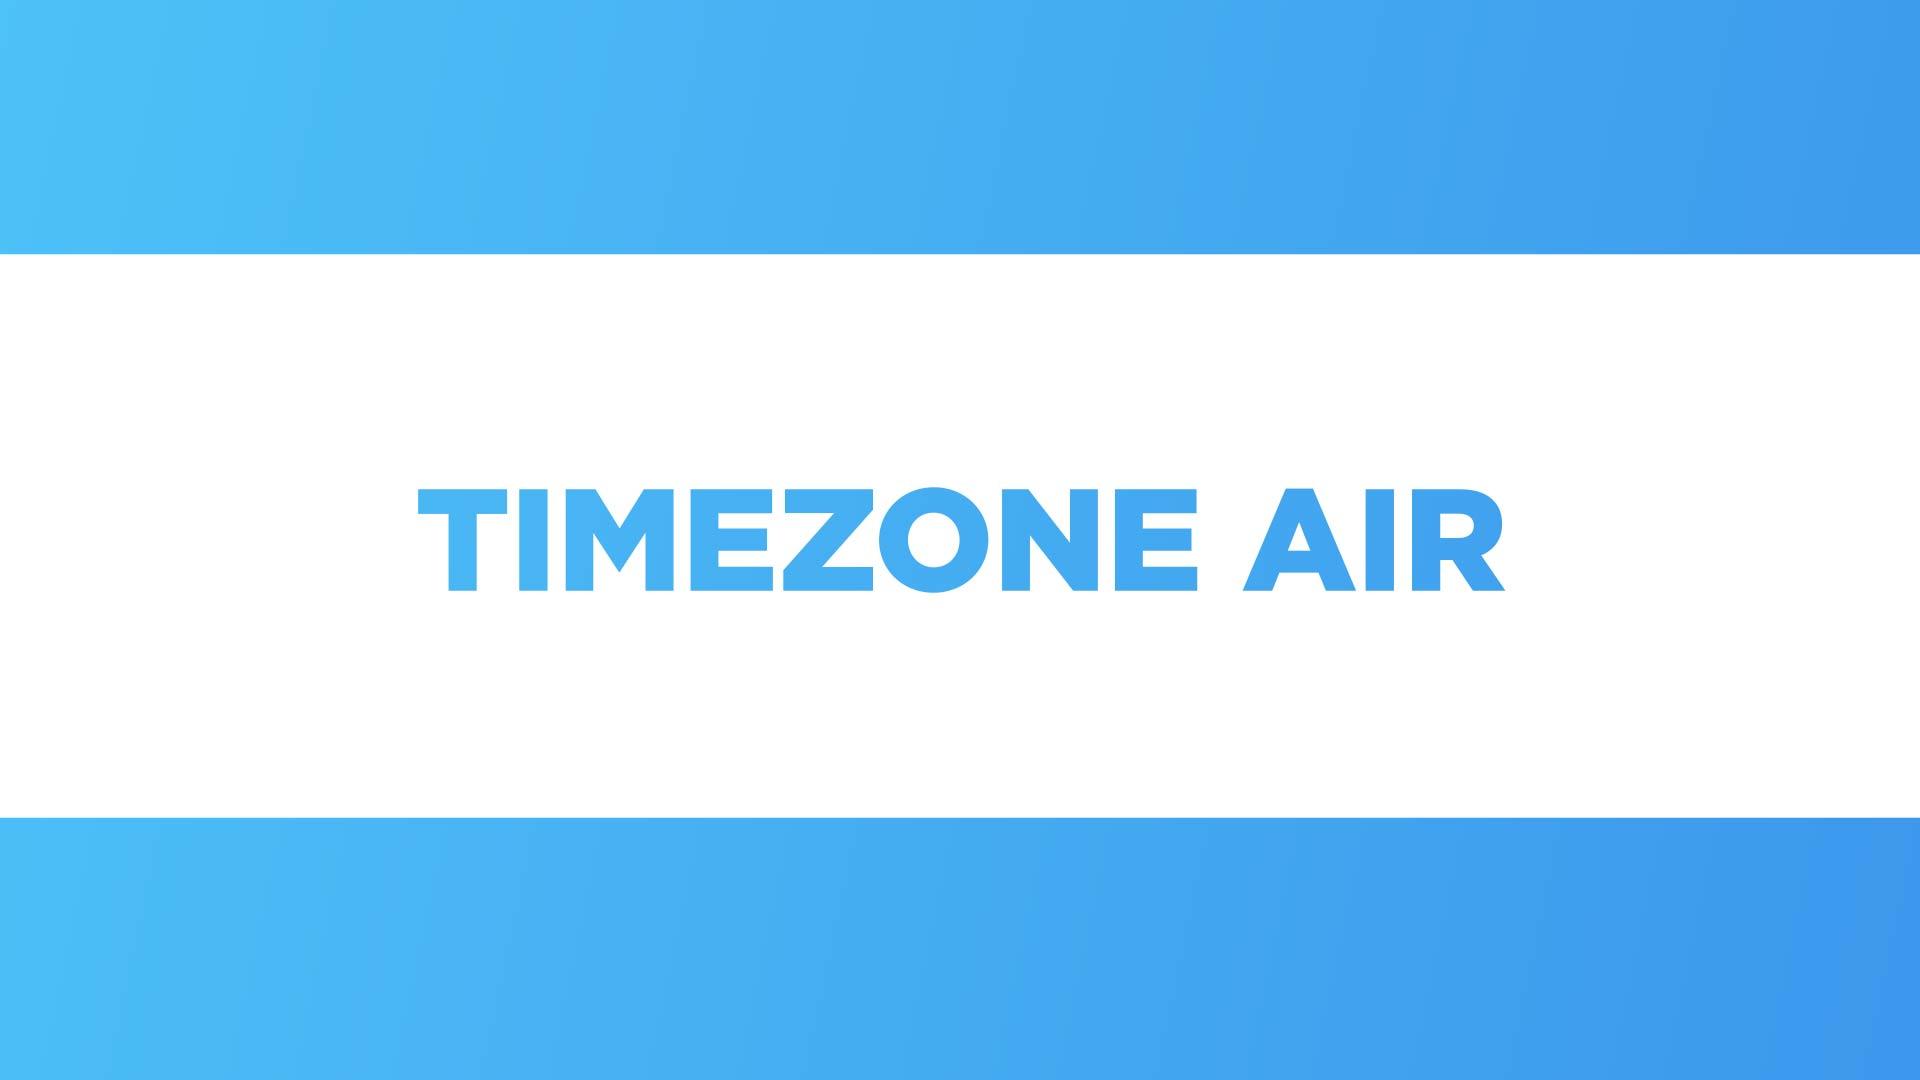 Timezone Air (0-00-44-09)